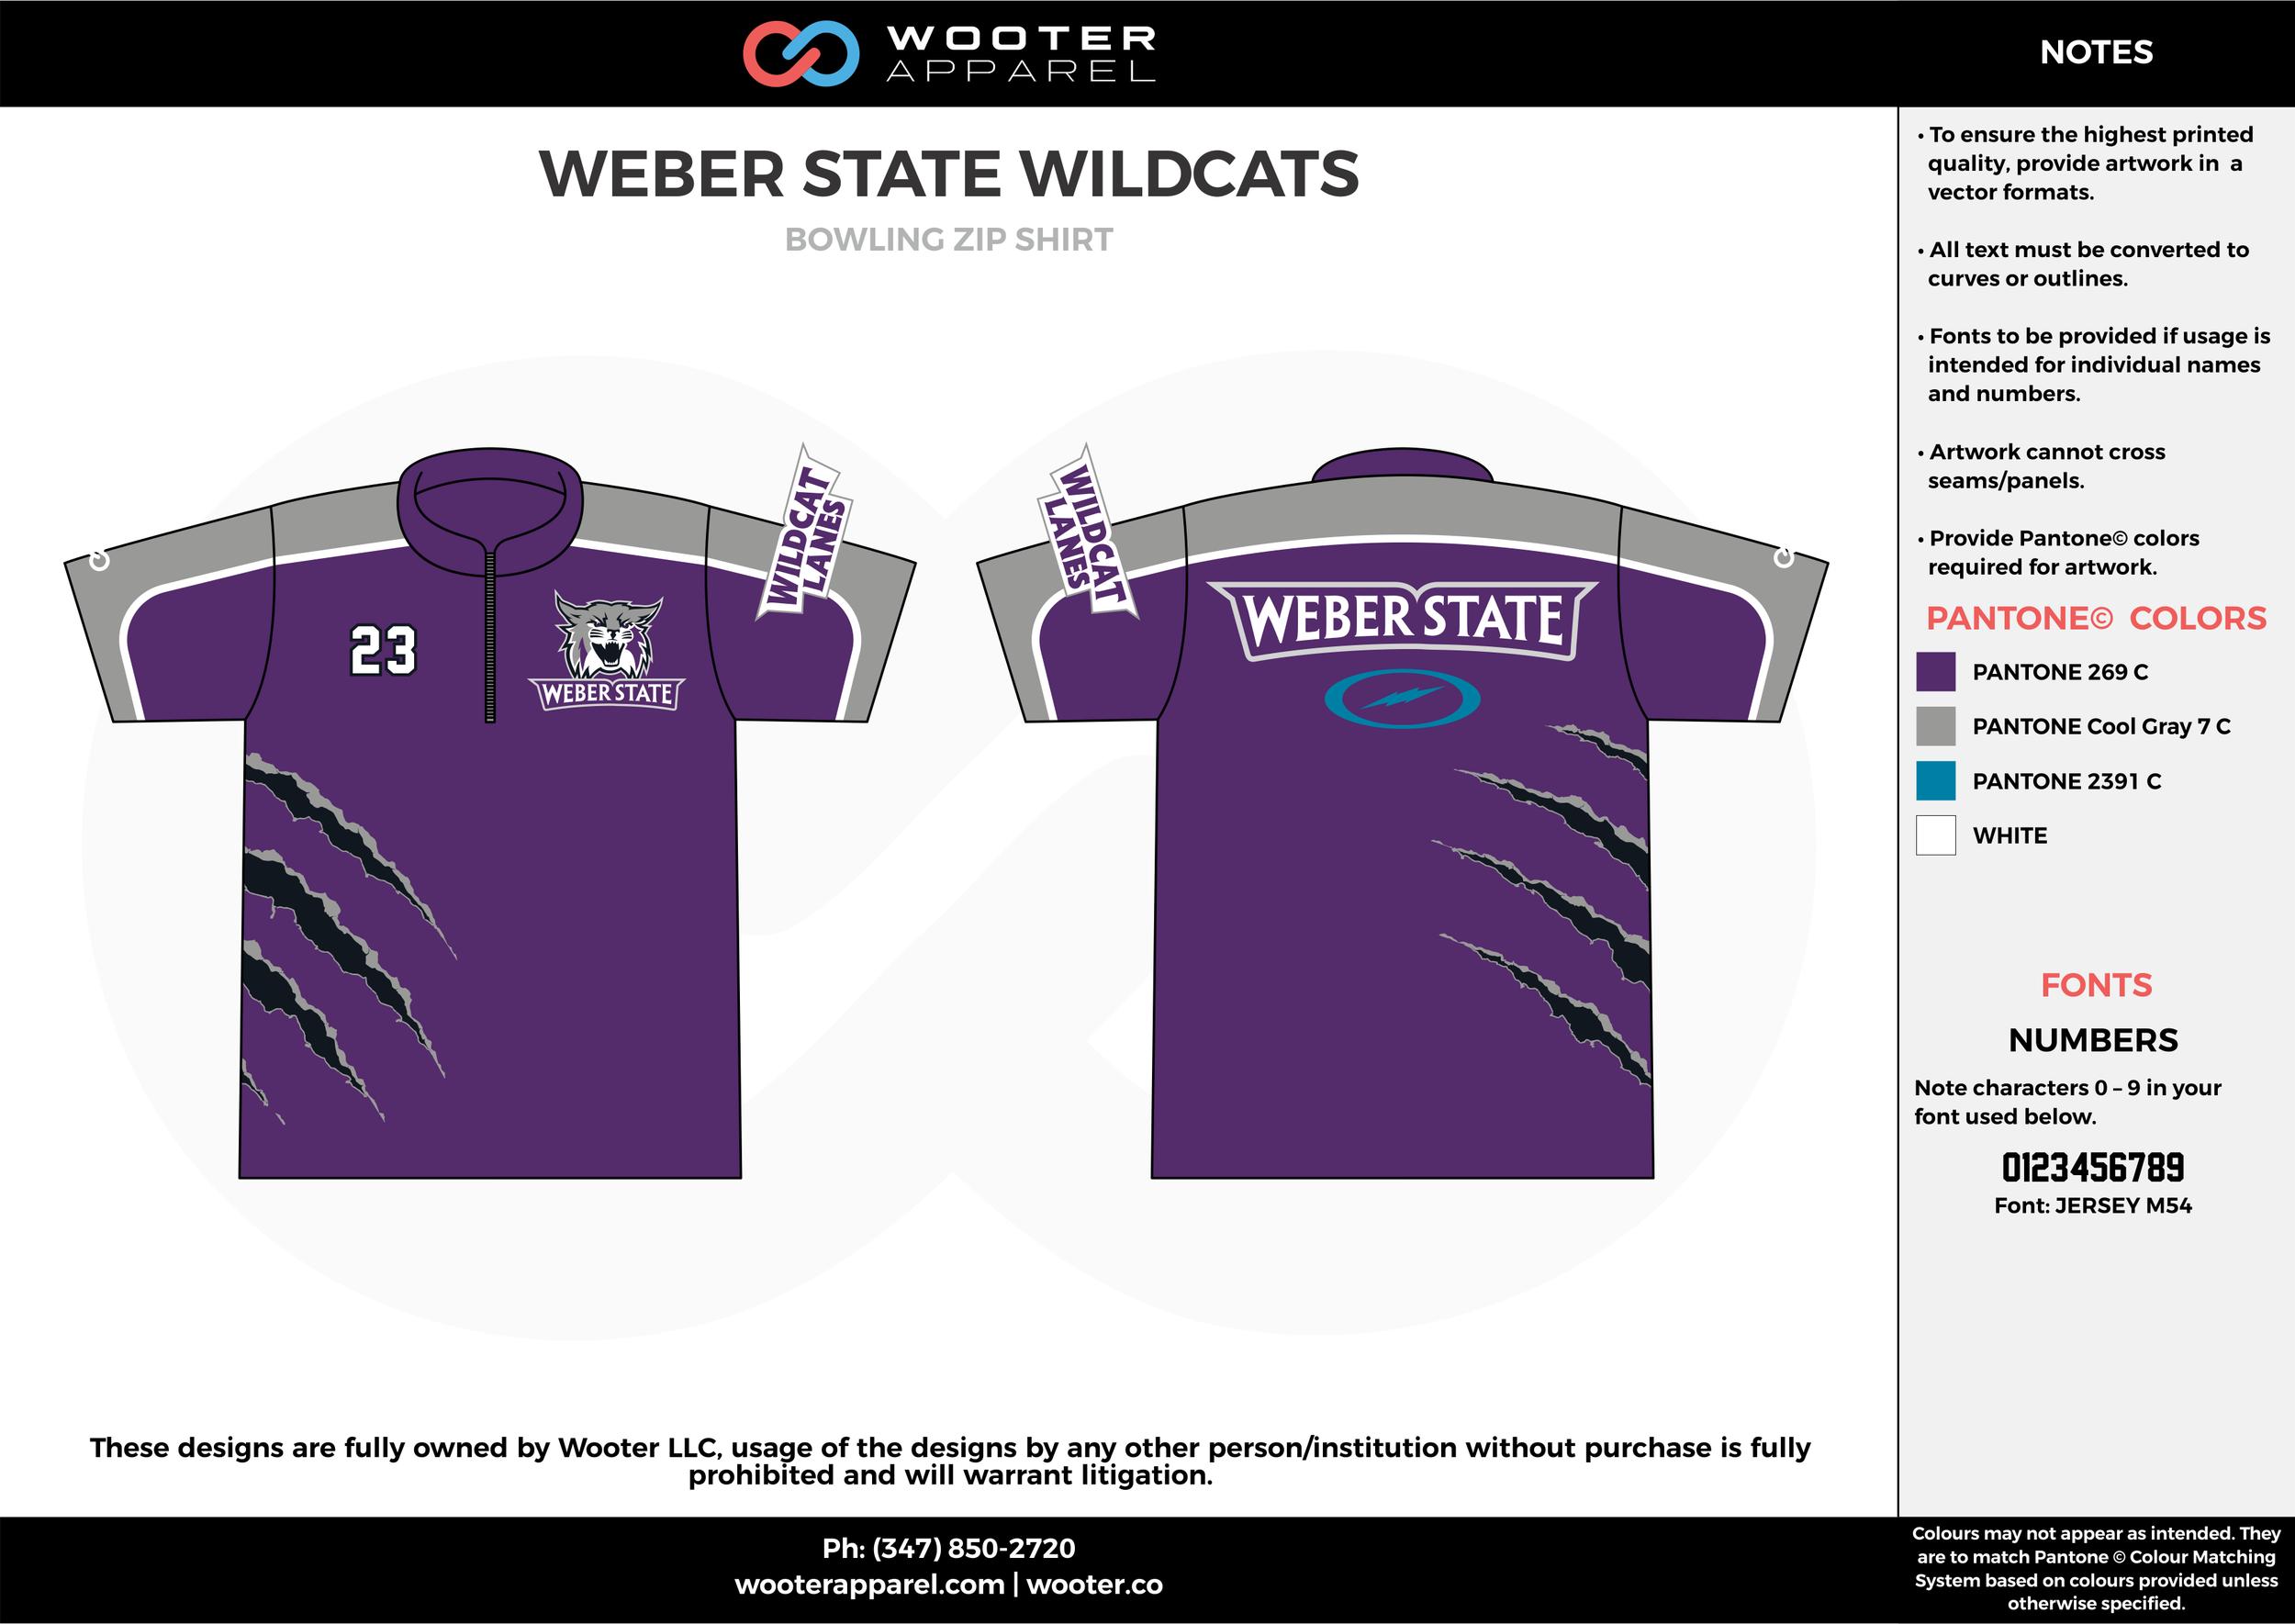 WEBER STATE WILDCATS violet gray blue bowling uniforms, shirts, quarter zip polo